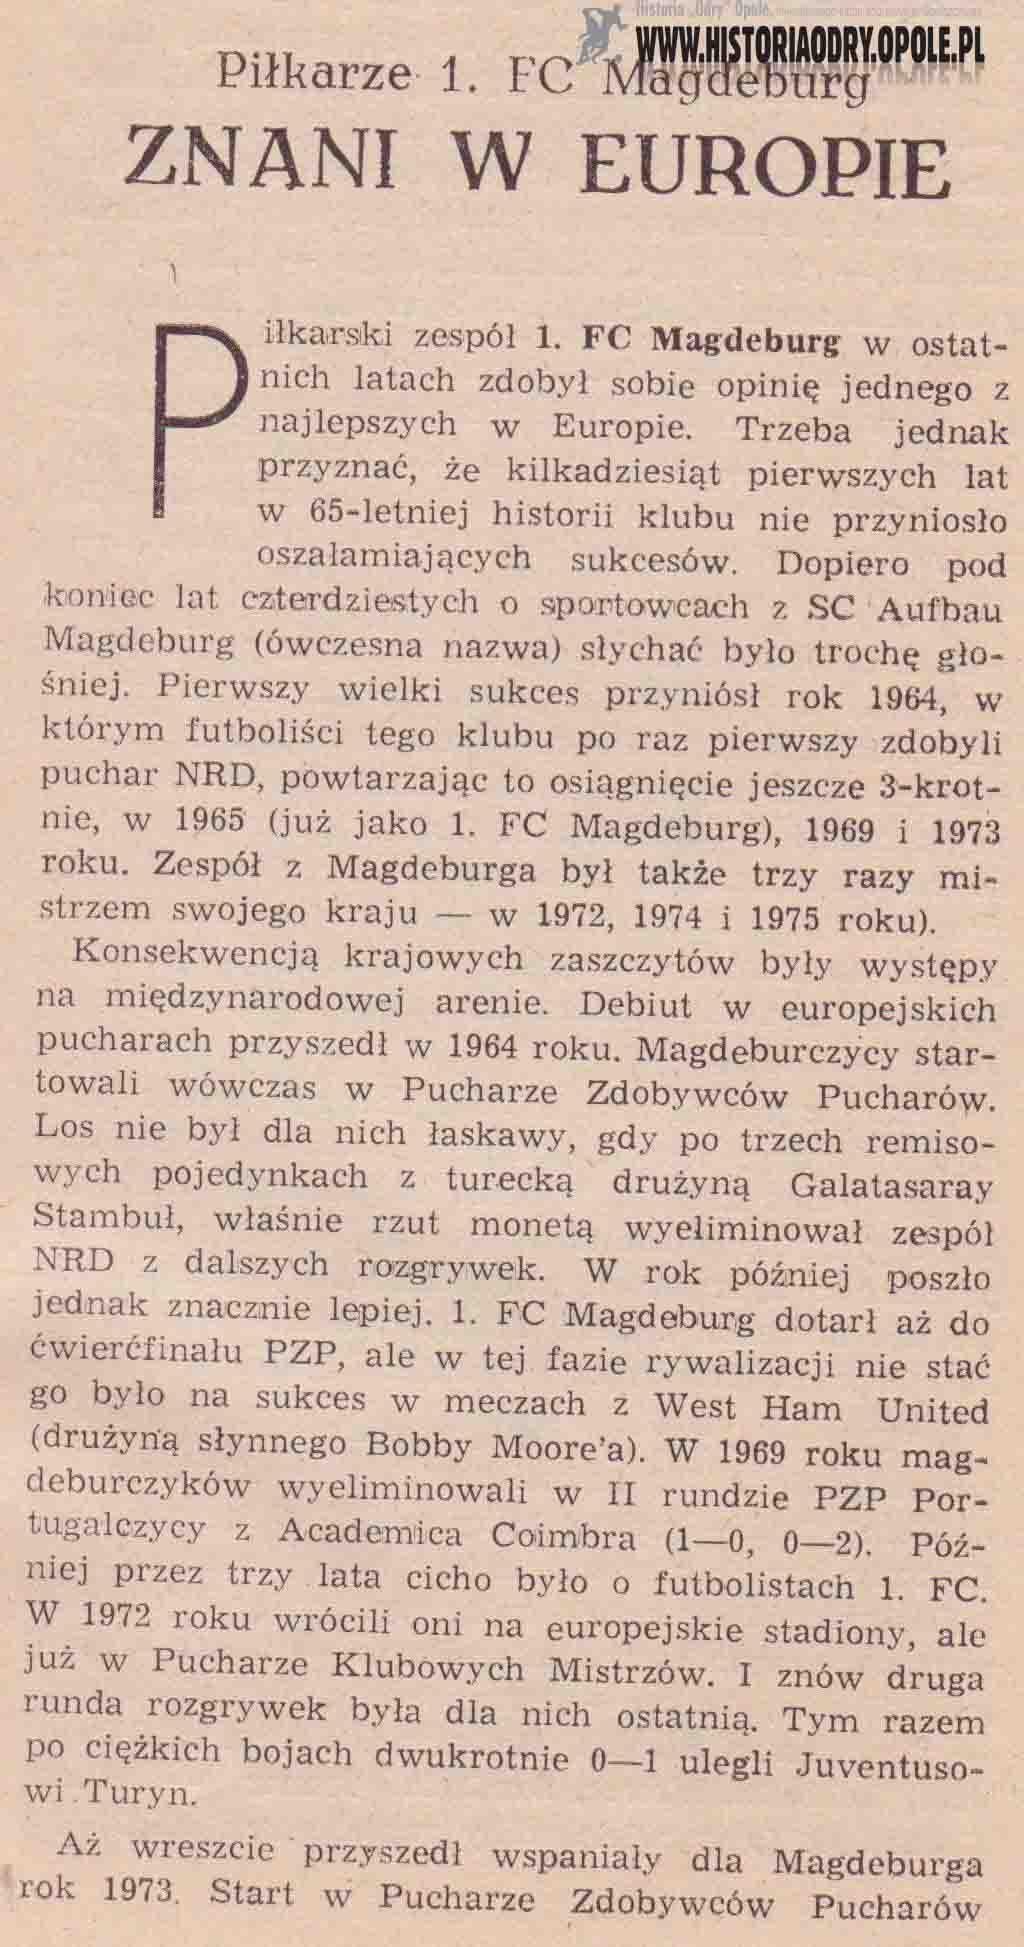 1. FC Magdeburg (broszurka 1).